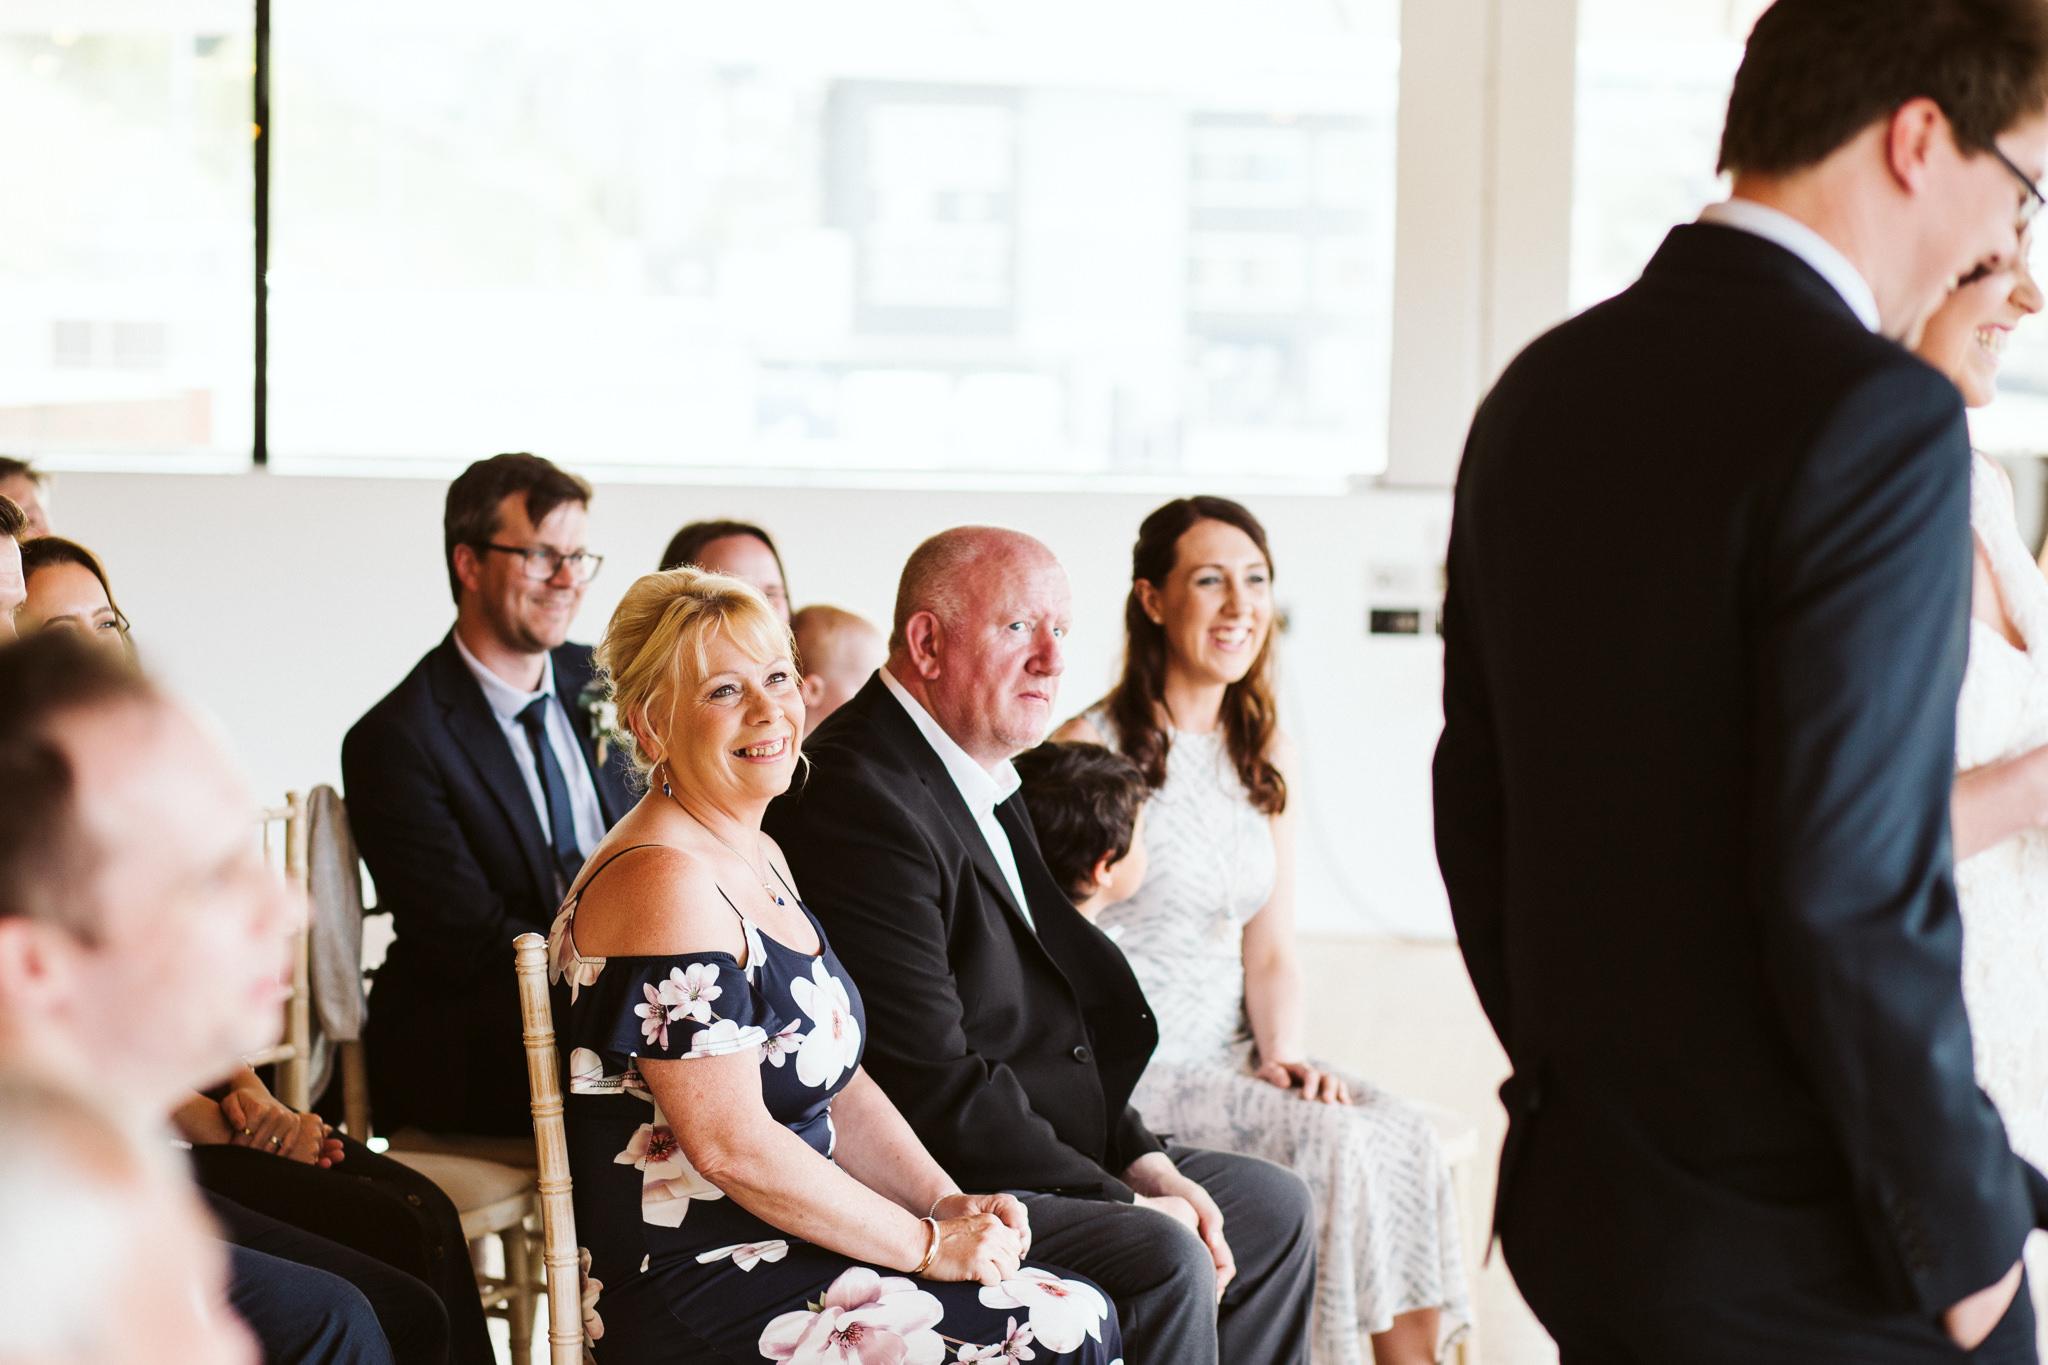 baltic-wedding-margarita-hope (25).jpg